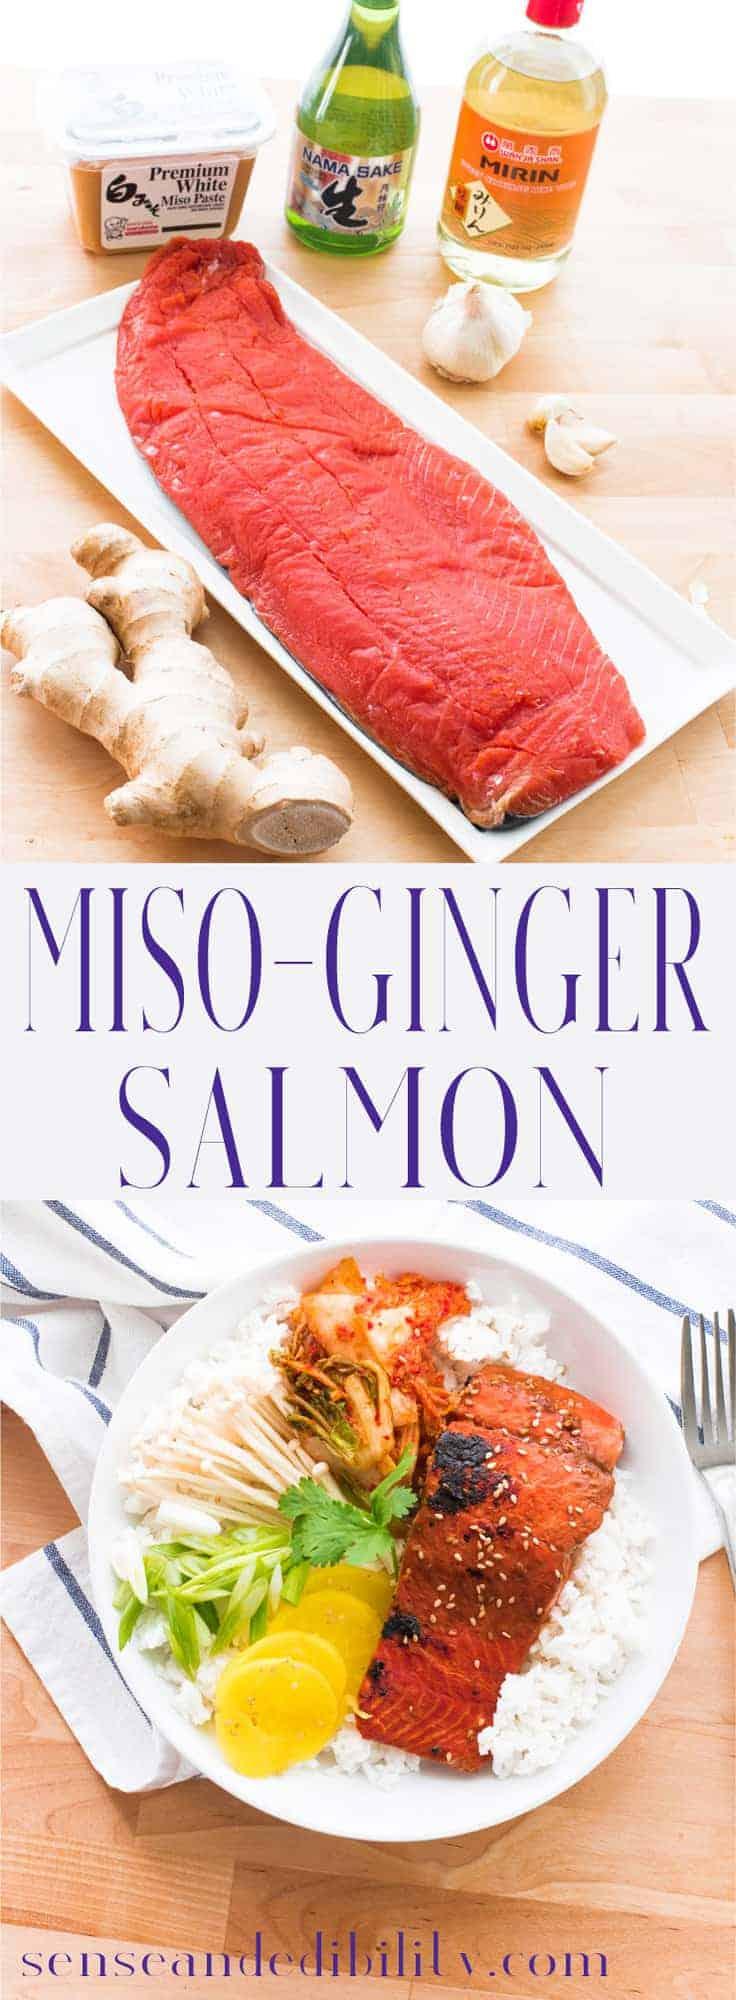 Sense & Edibility's Miso-Ginger Salmon Pin